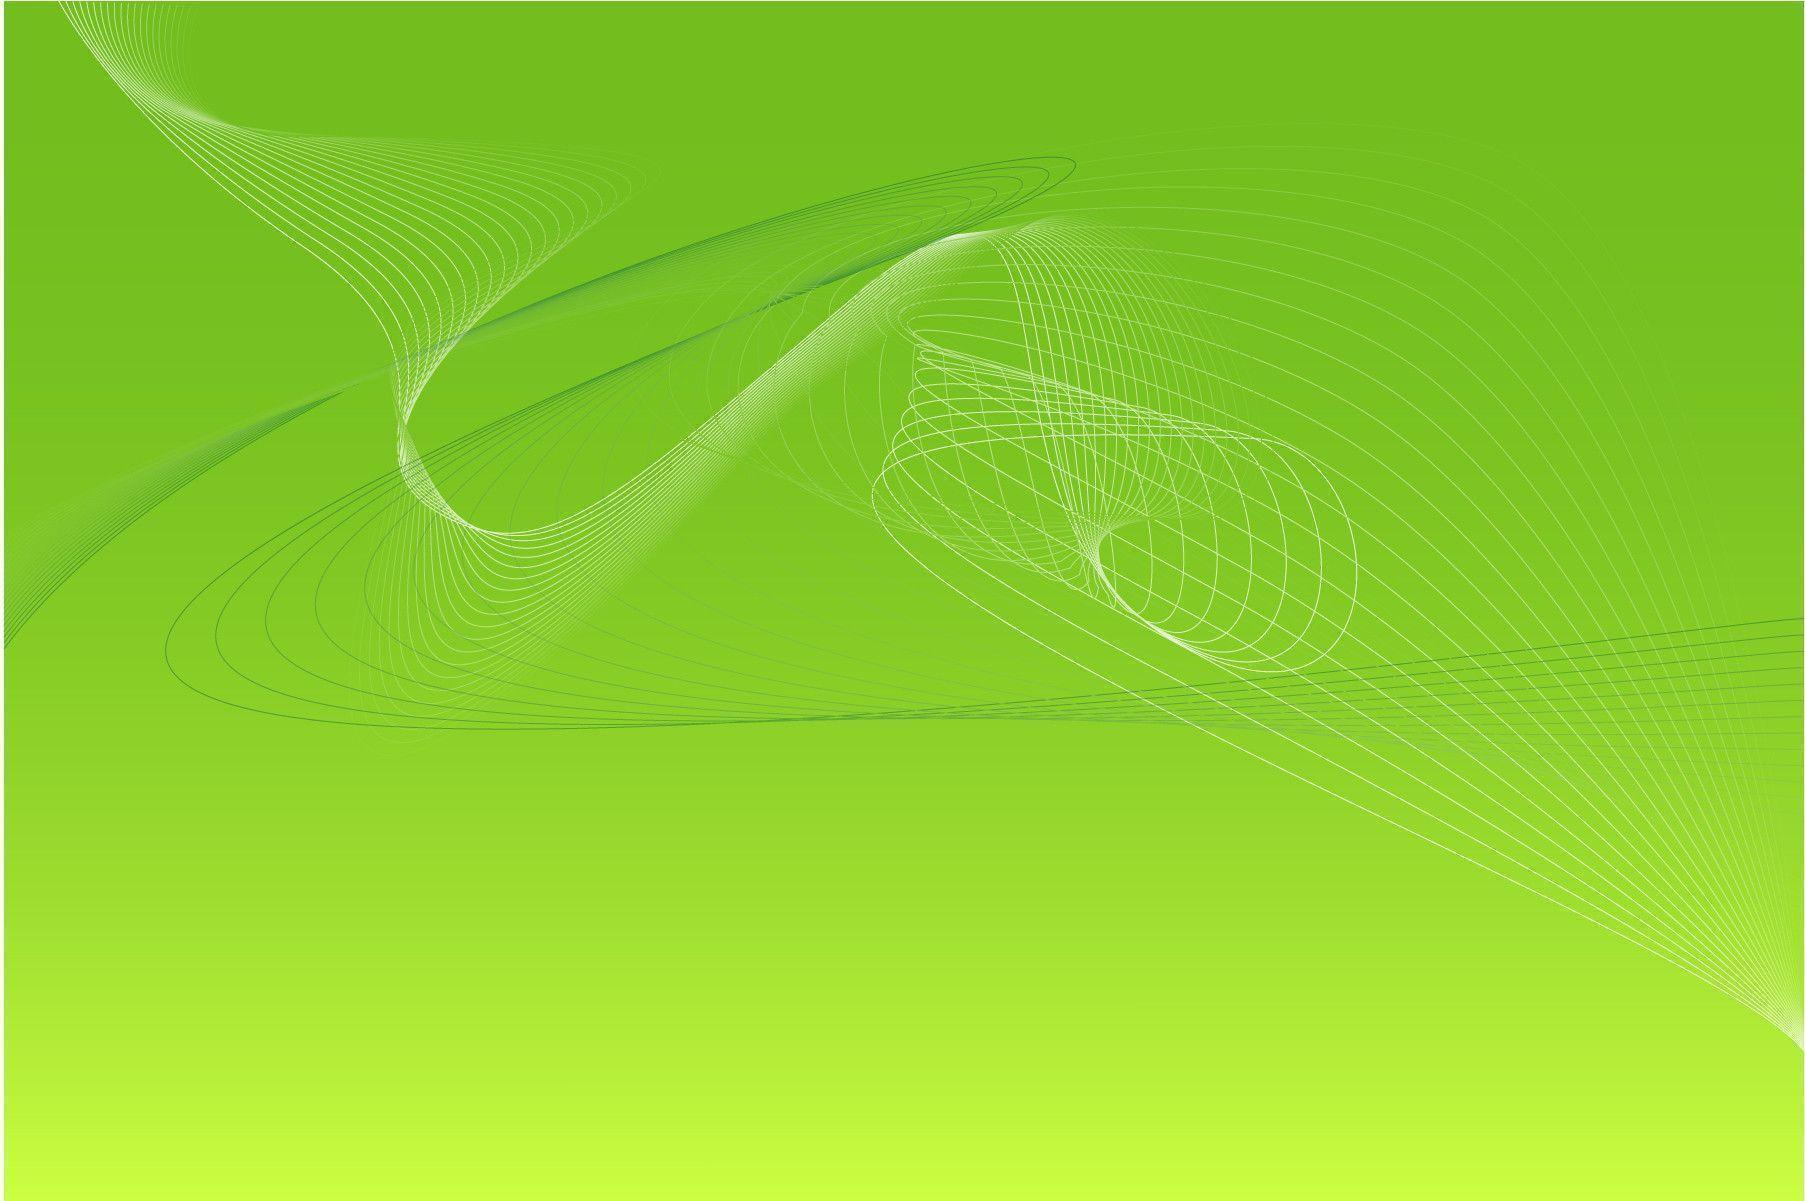 Light Green Backgrounds Wallpaper Cave  sc 1 st  Democraciaejustica & Green Wave Lighting - Democraciaejustica